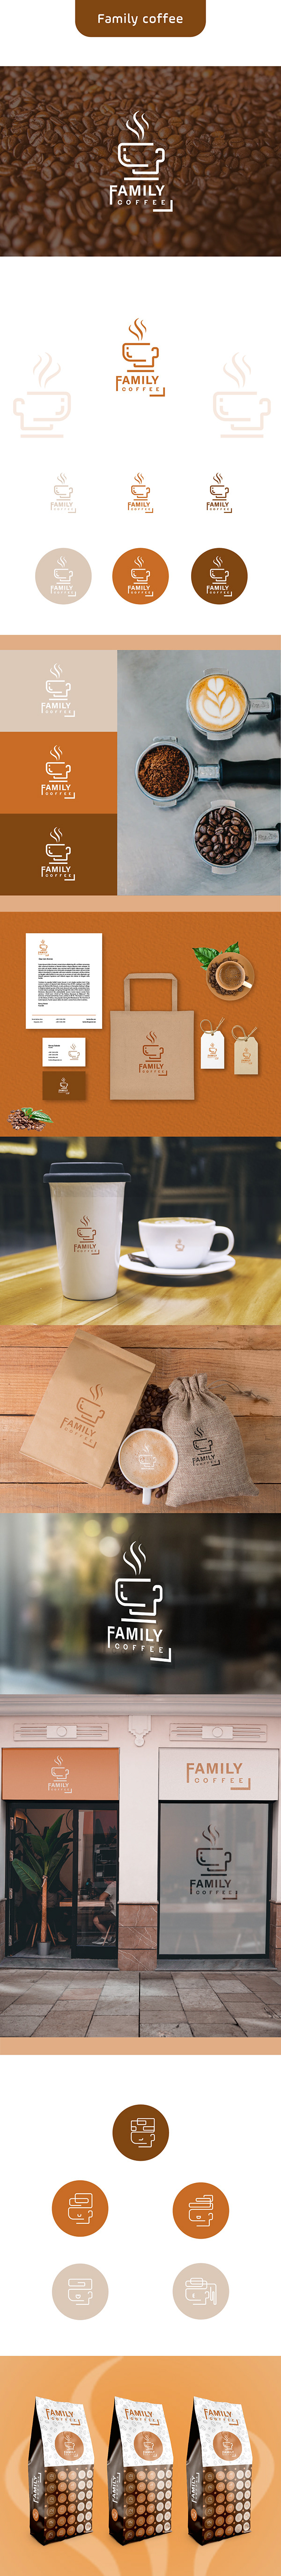 FAMILY COFFEE